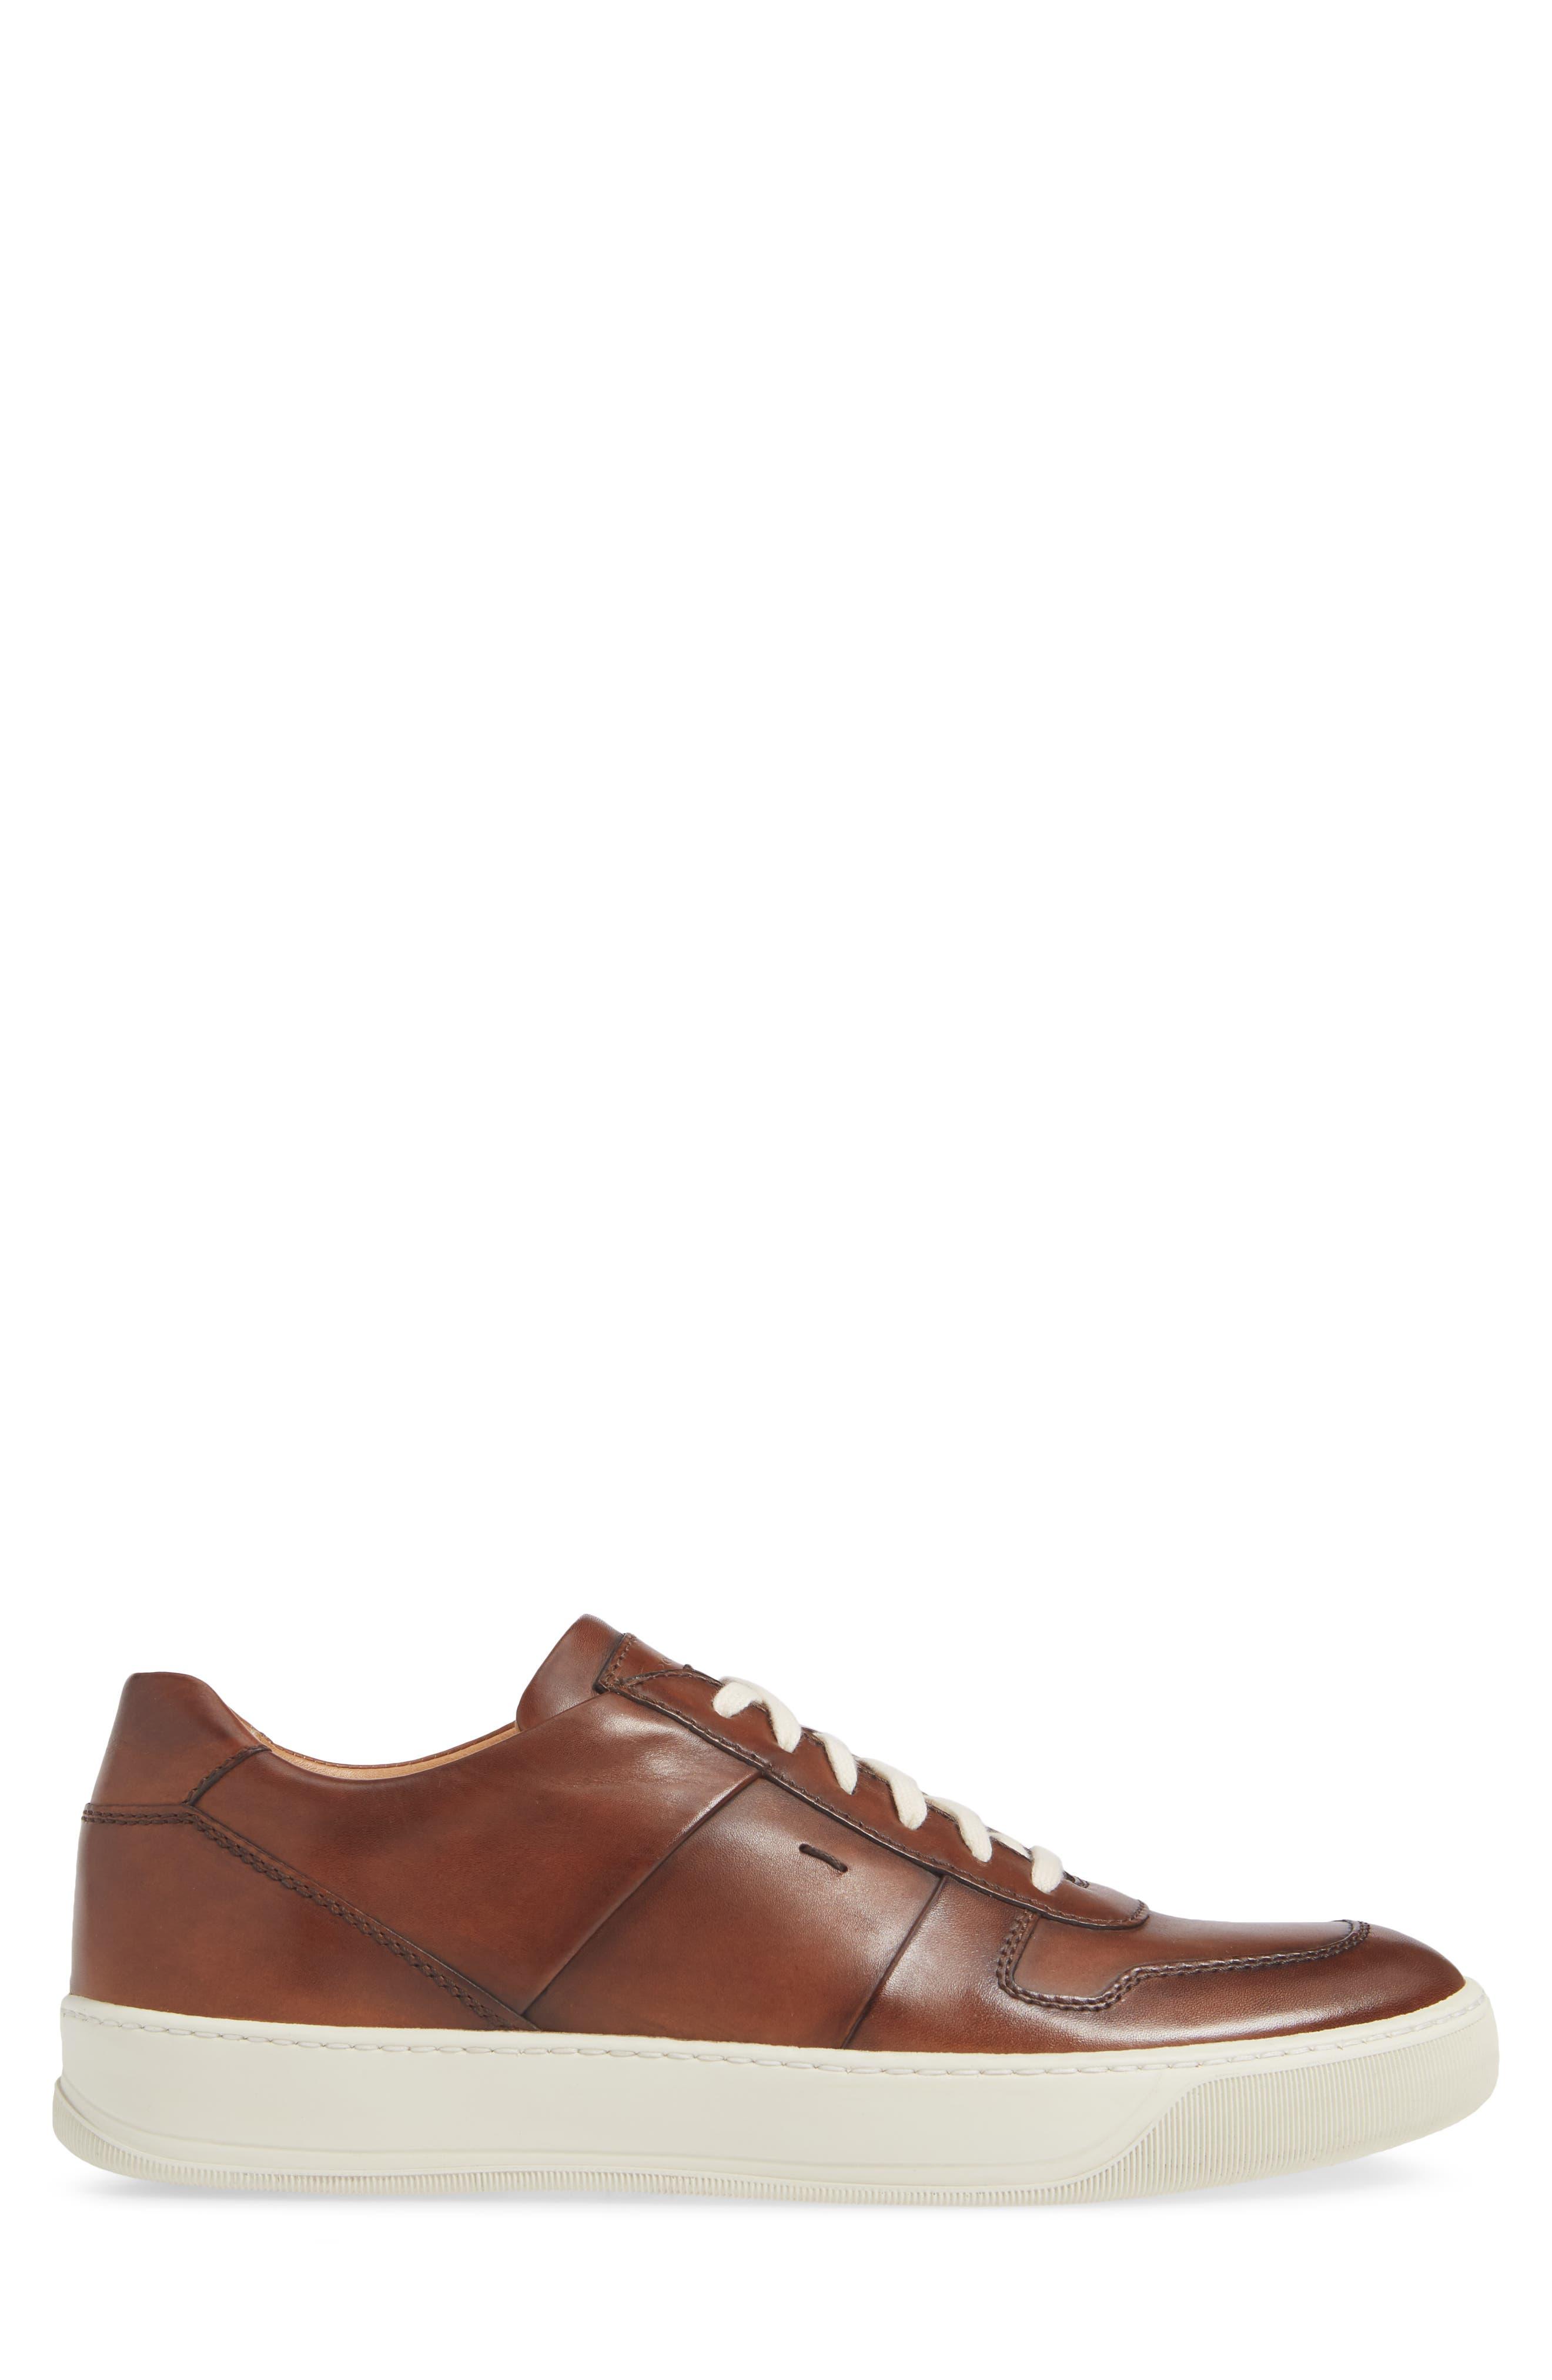 Birch Sneaker,                             Alternate thumbnail 3, color,                             BROWN